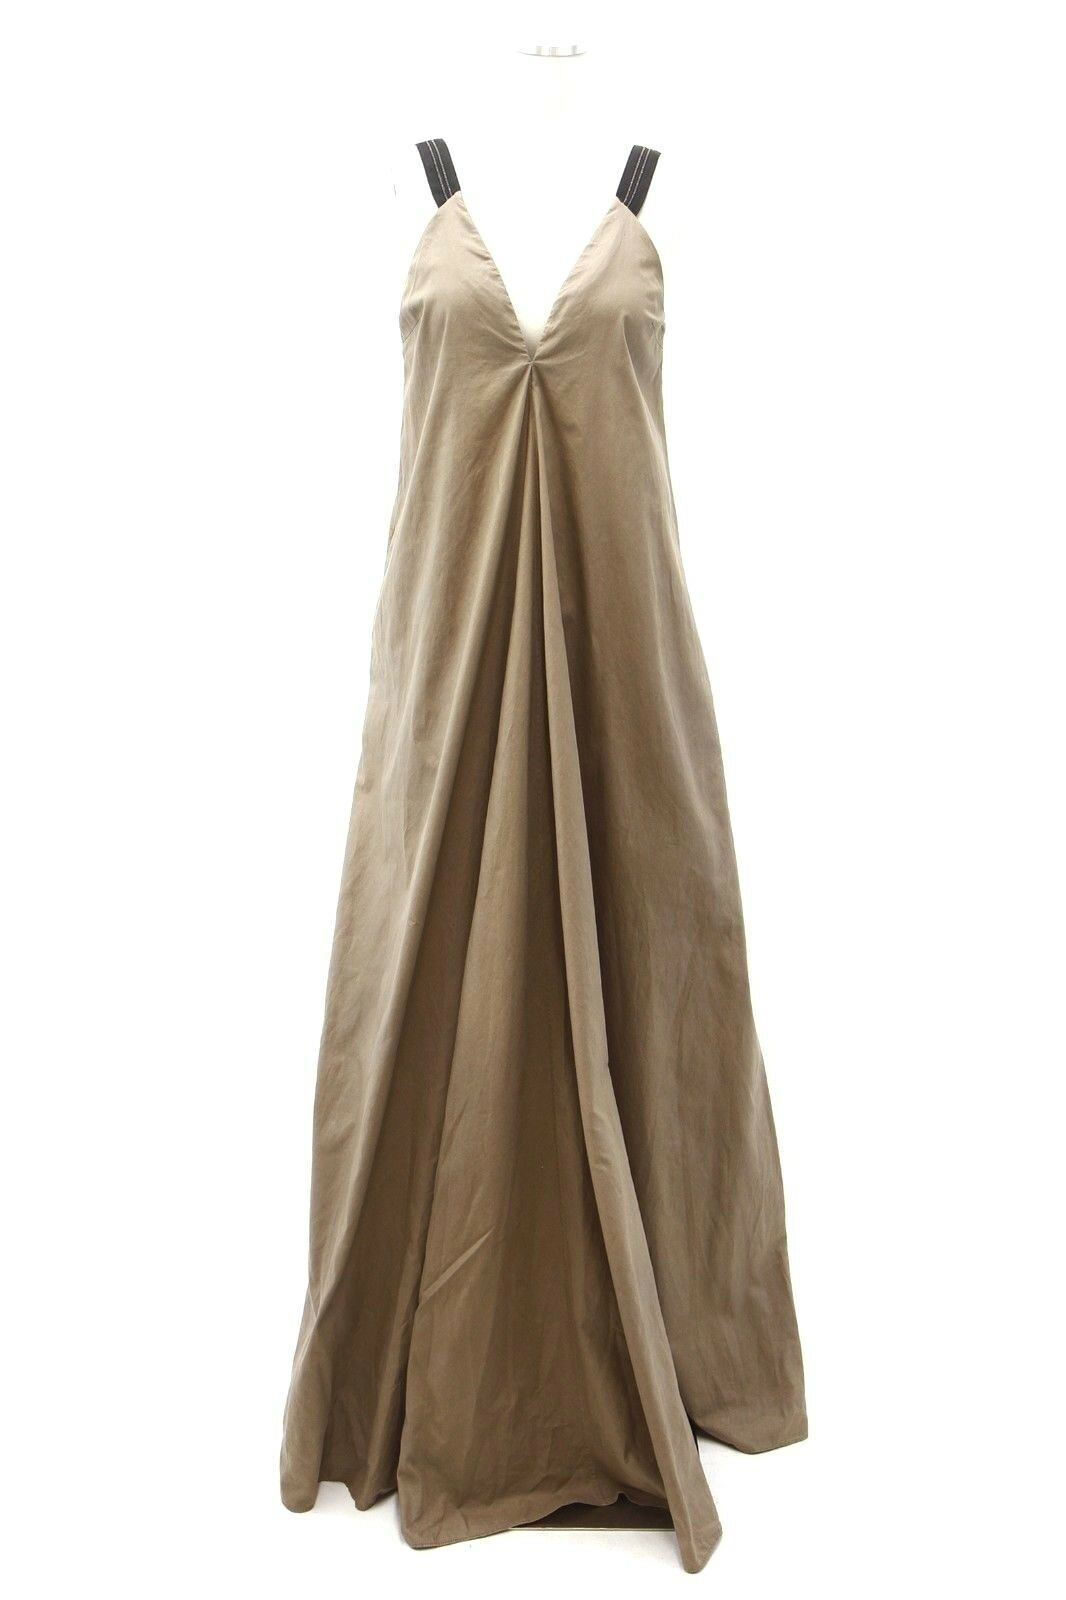 NWT 3695 Brunello Cucinelli Silk Strap Monili Beaded Khaki A-Line Gown Sz M A186